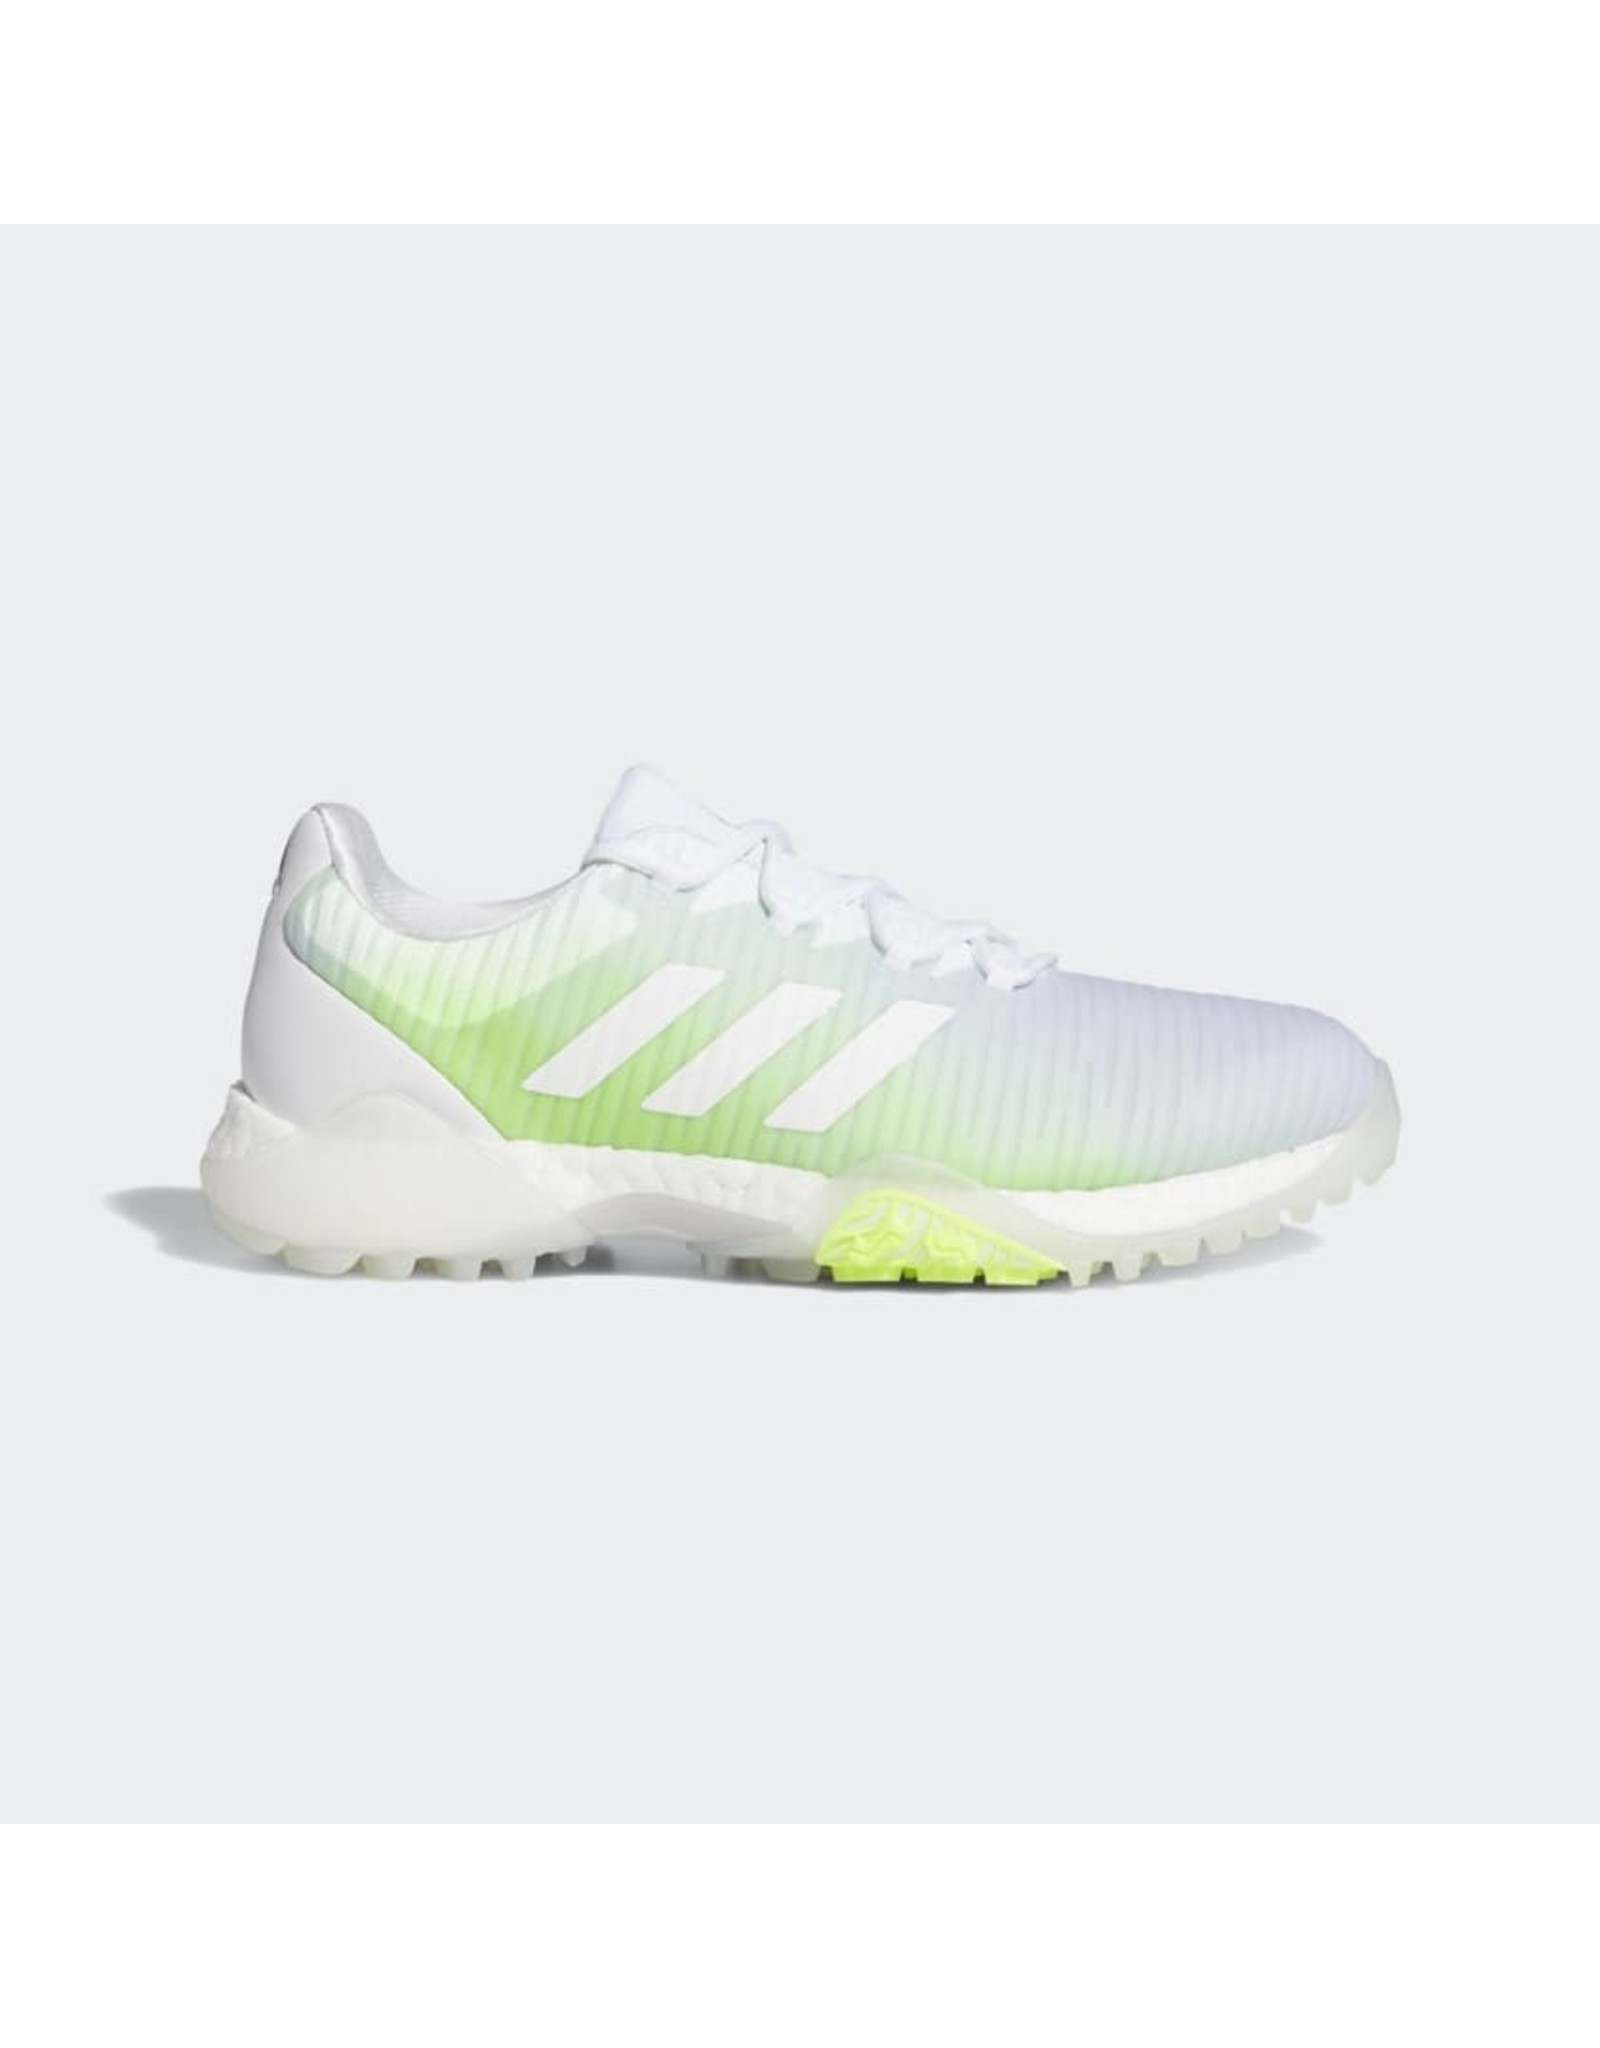 Adidas Adidas Women's CodeChaos Neon/White